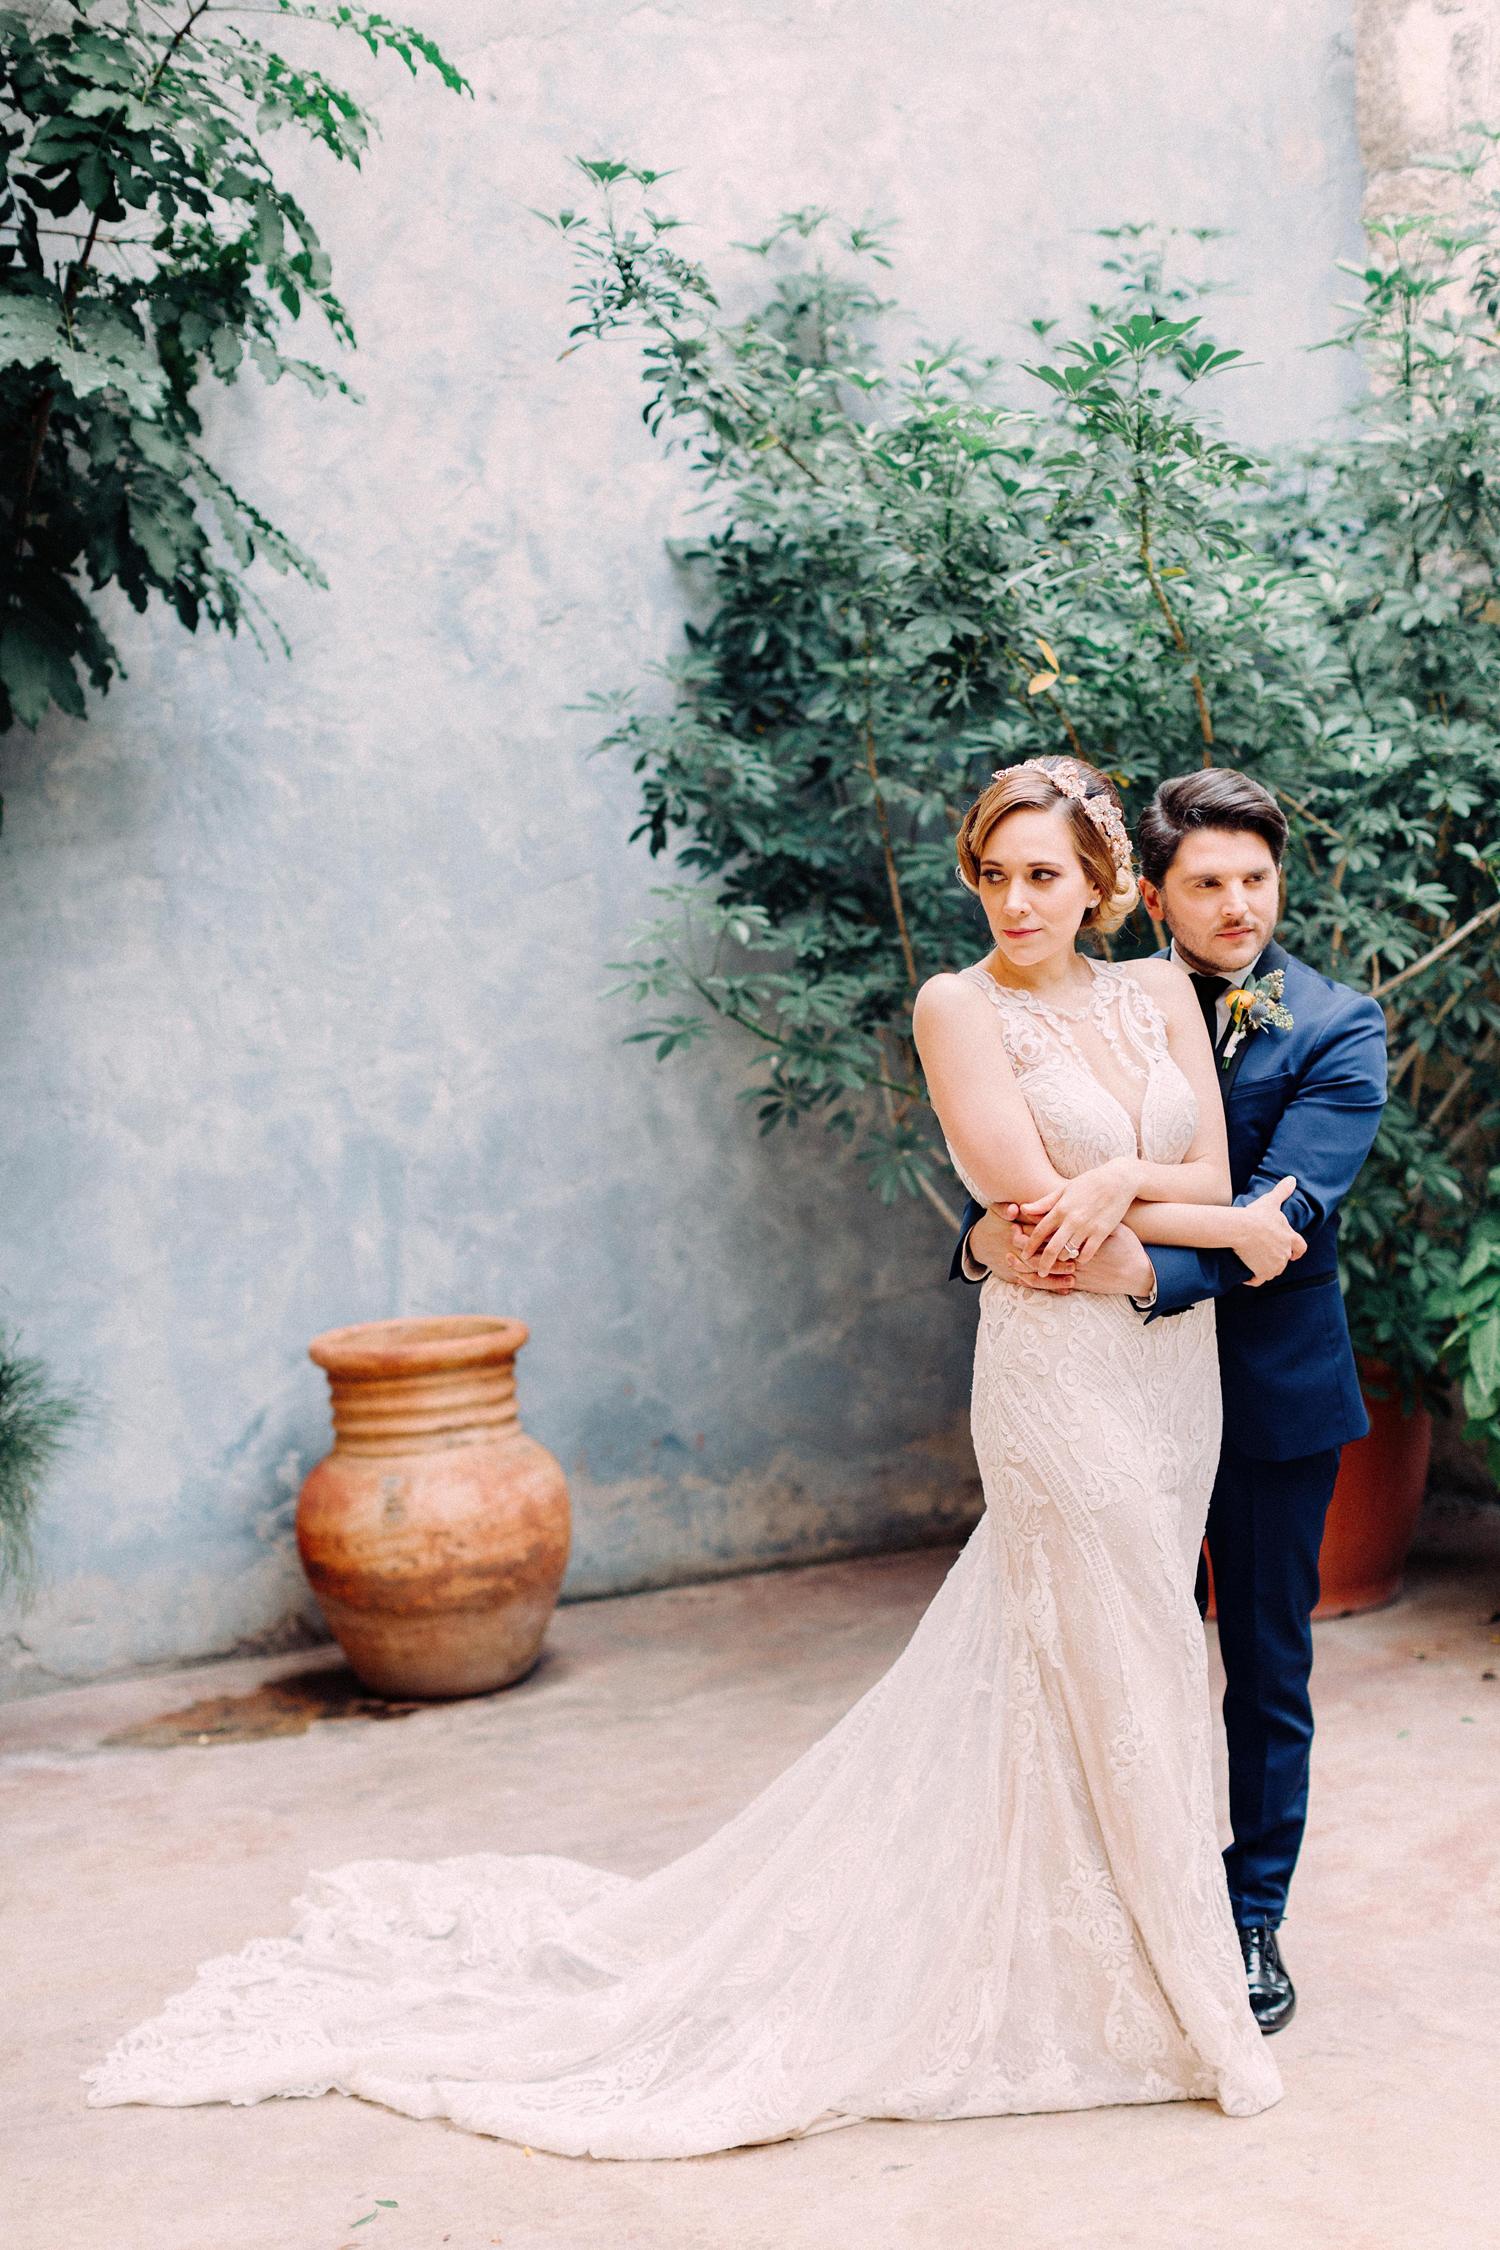 040-alaamarzouk-alaamarzoukphotography-mcallenweddingphotographer-alaa-marzouk-mcallen-mission-wedding-texas-venue-photography-wedding-california-bride-bridal-engagement-austin-elopement.jpg